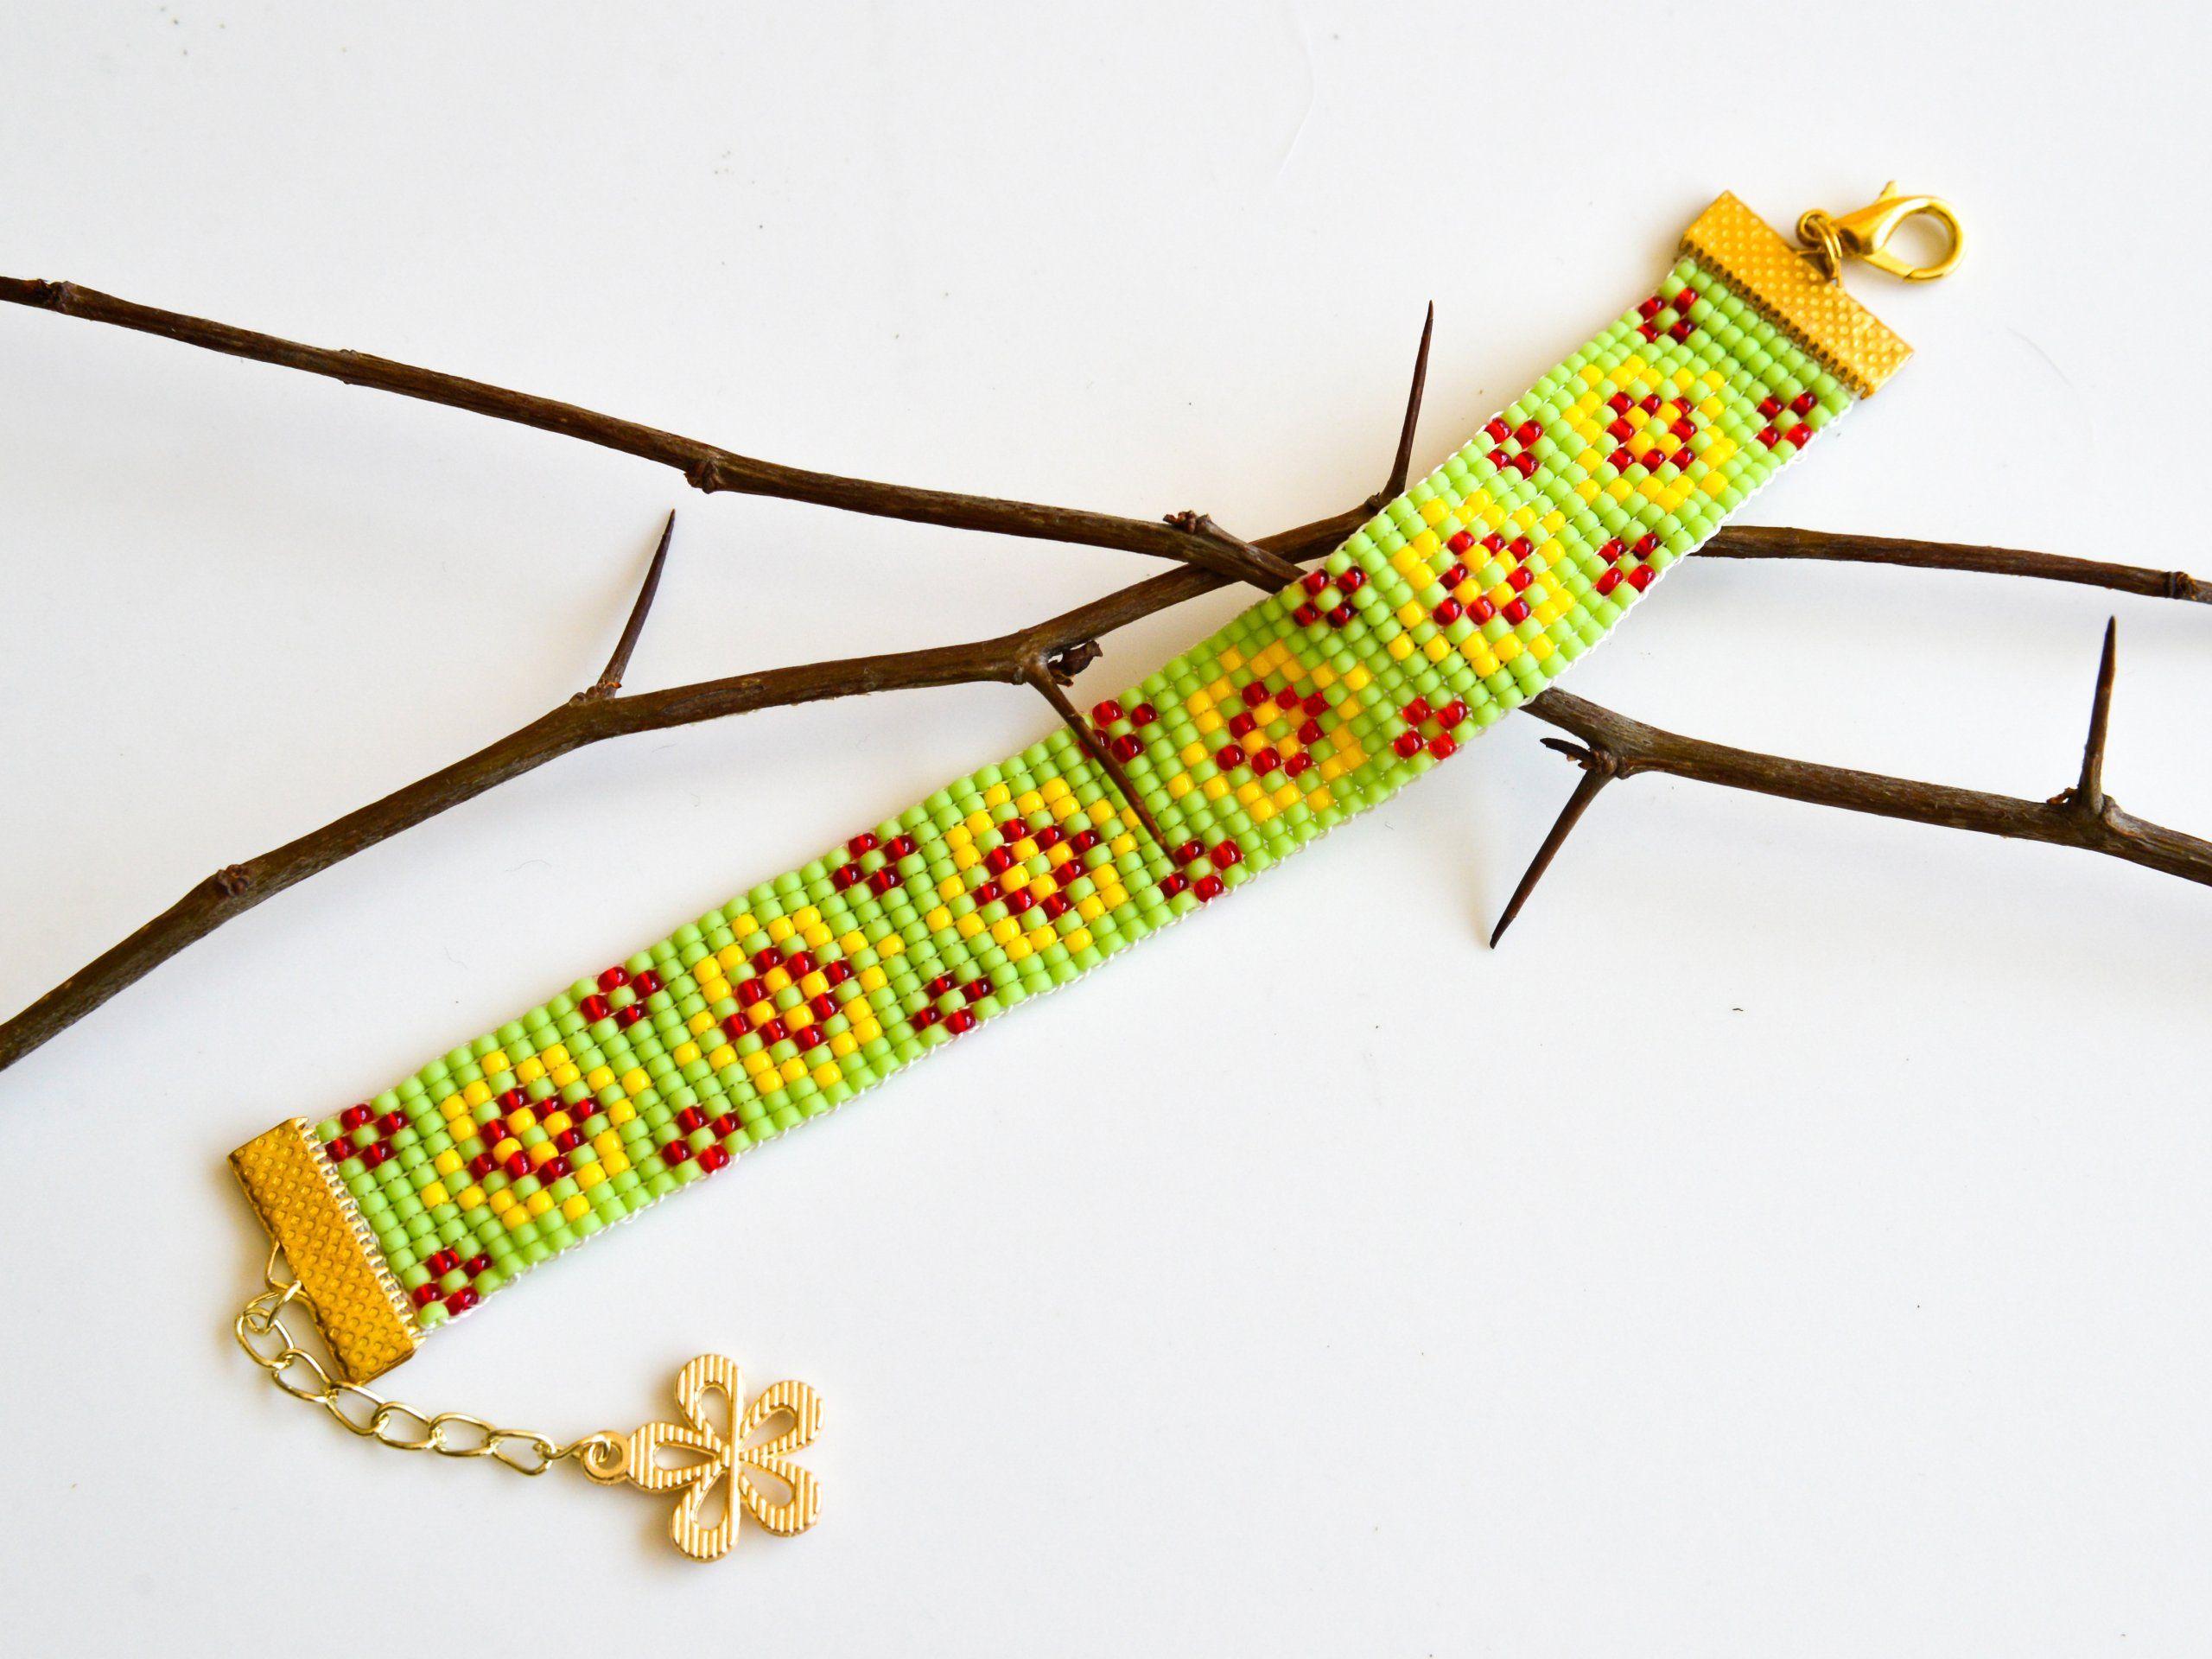 Bransoletka Zielona Zolta Boho Etno Prezent 7253344555 Oficjalne Archiwum Allegro Embroidered Friendship Bracelet Friendship Bracelets Embroidered